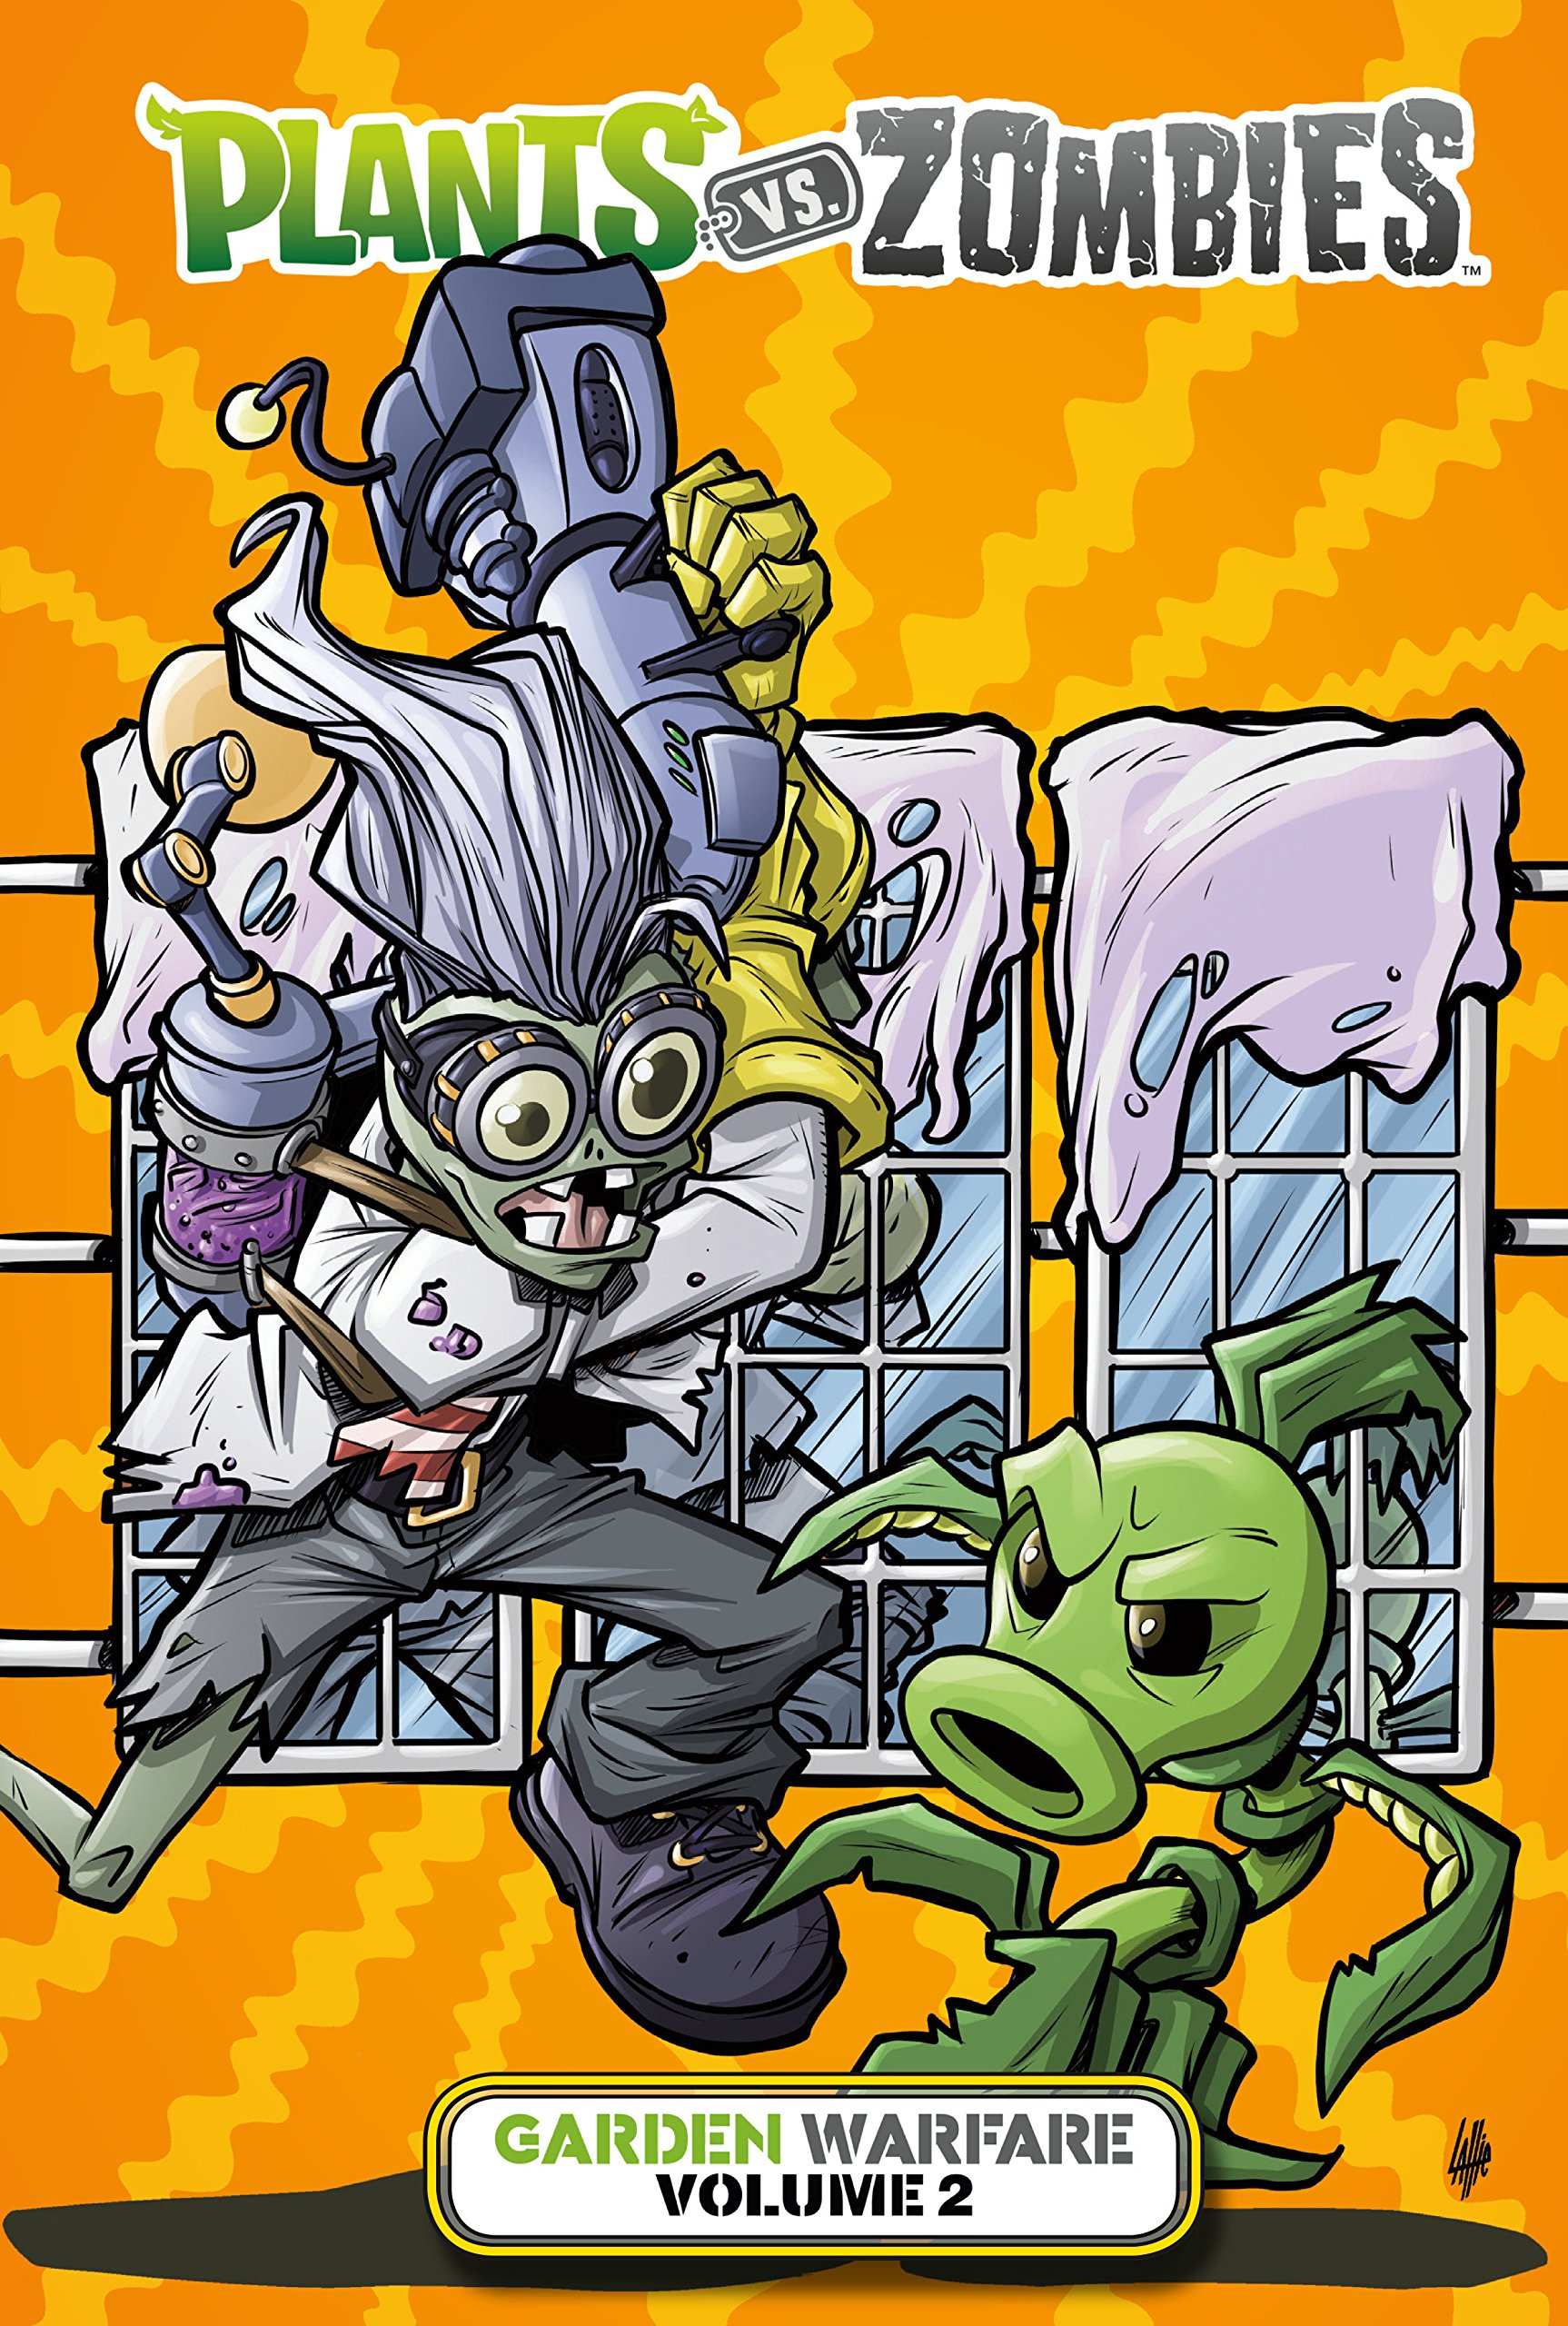 Amazon.com: Plants Vs. Zombies: Garden Warfare Volume 2 (9781506705484):  Paul Tobin, Tim Lattie: Books